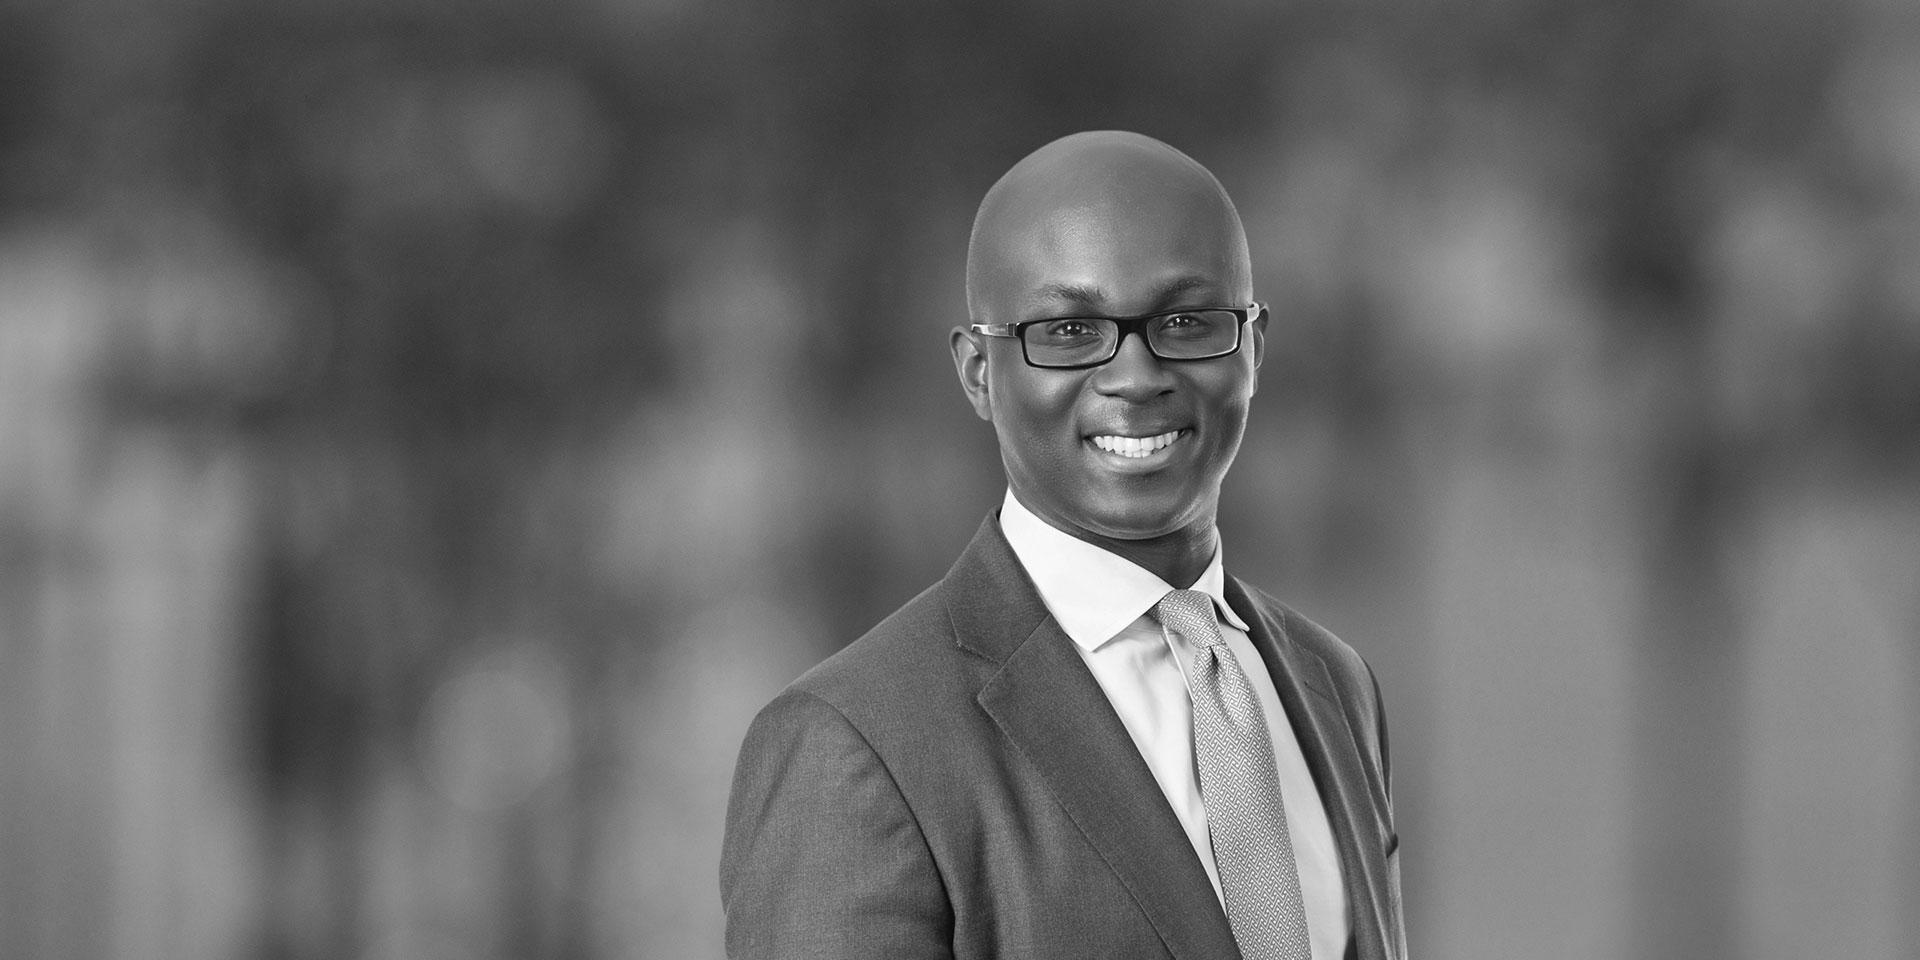 Joshua Apeadu-Siaw